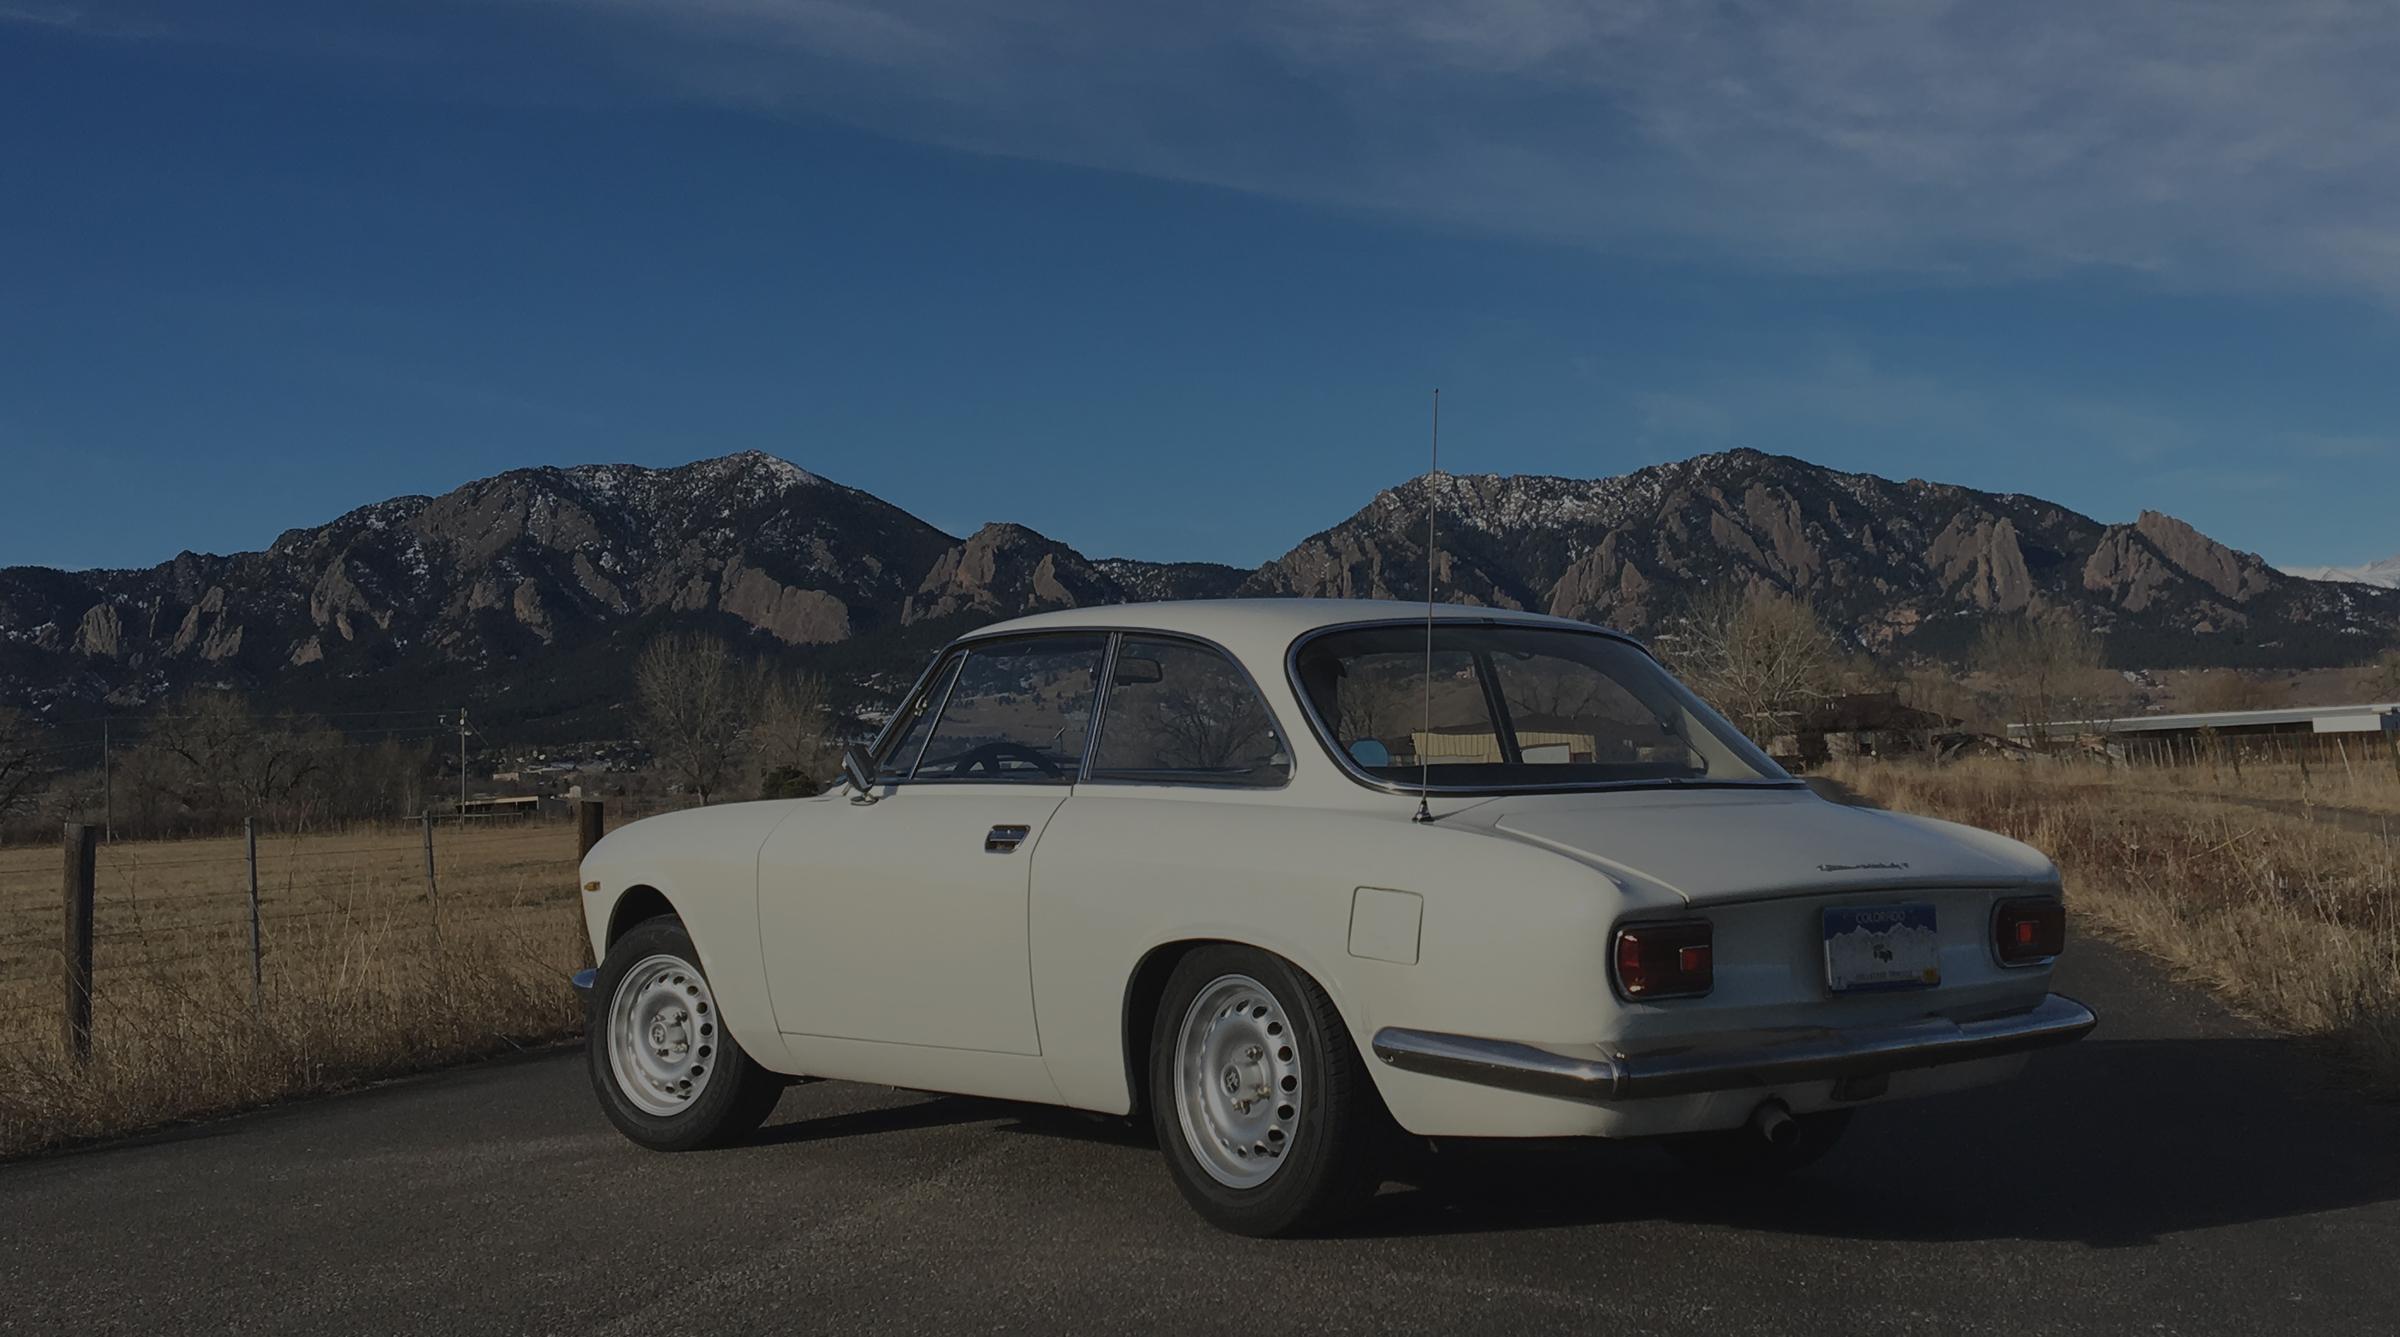 Alfa Romeo Giulia Gt Gtv 1965 74 Centerline International